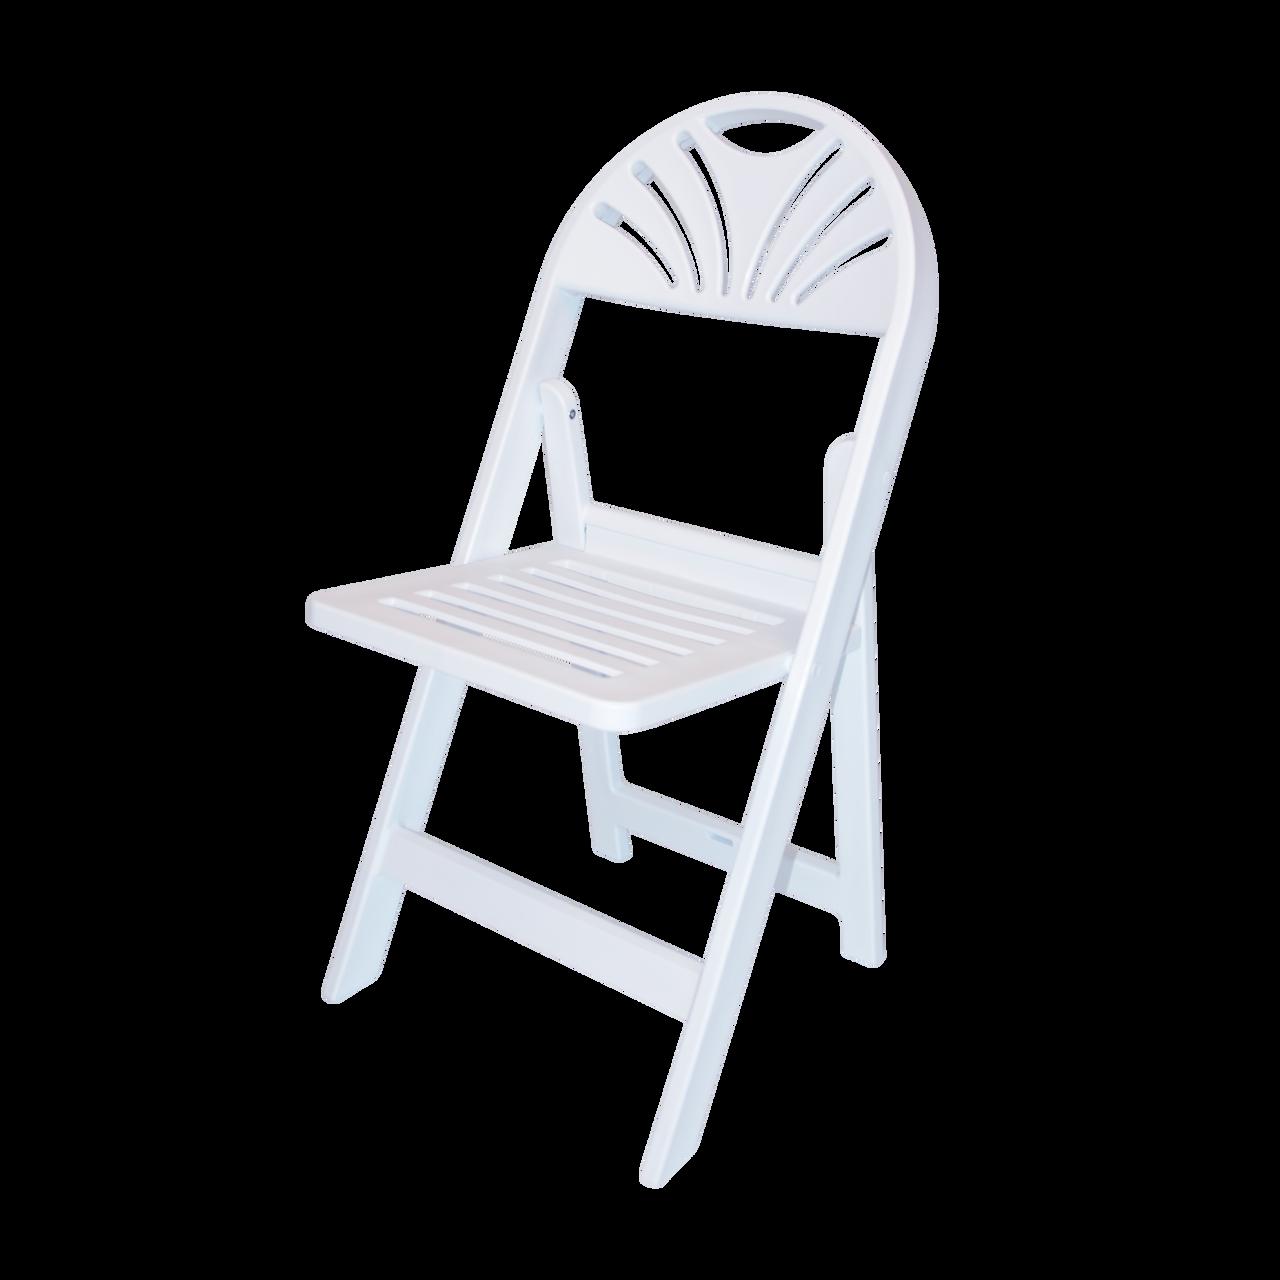 Rhino White Slatted Resin Fan Back Folding Chair - 100% Virgin Resin,  Resistant To Warping & Fading